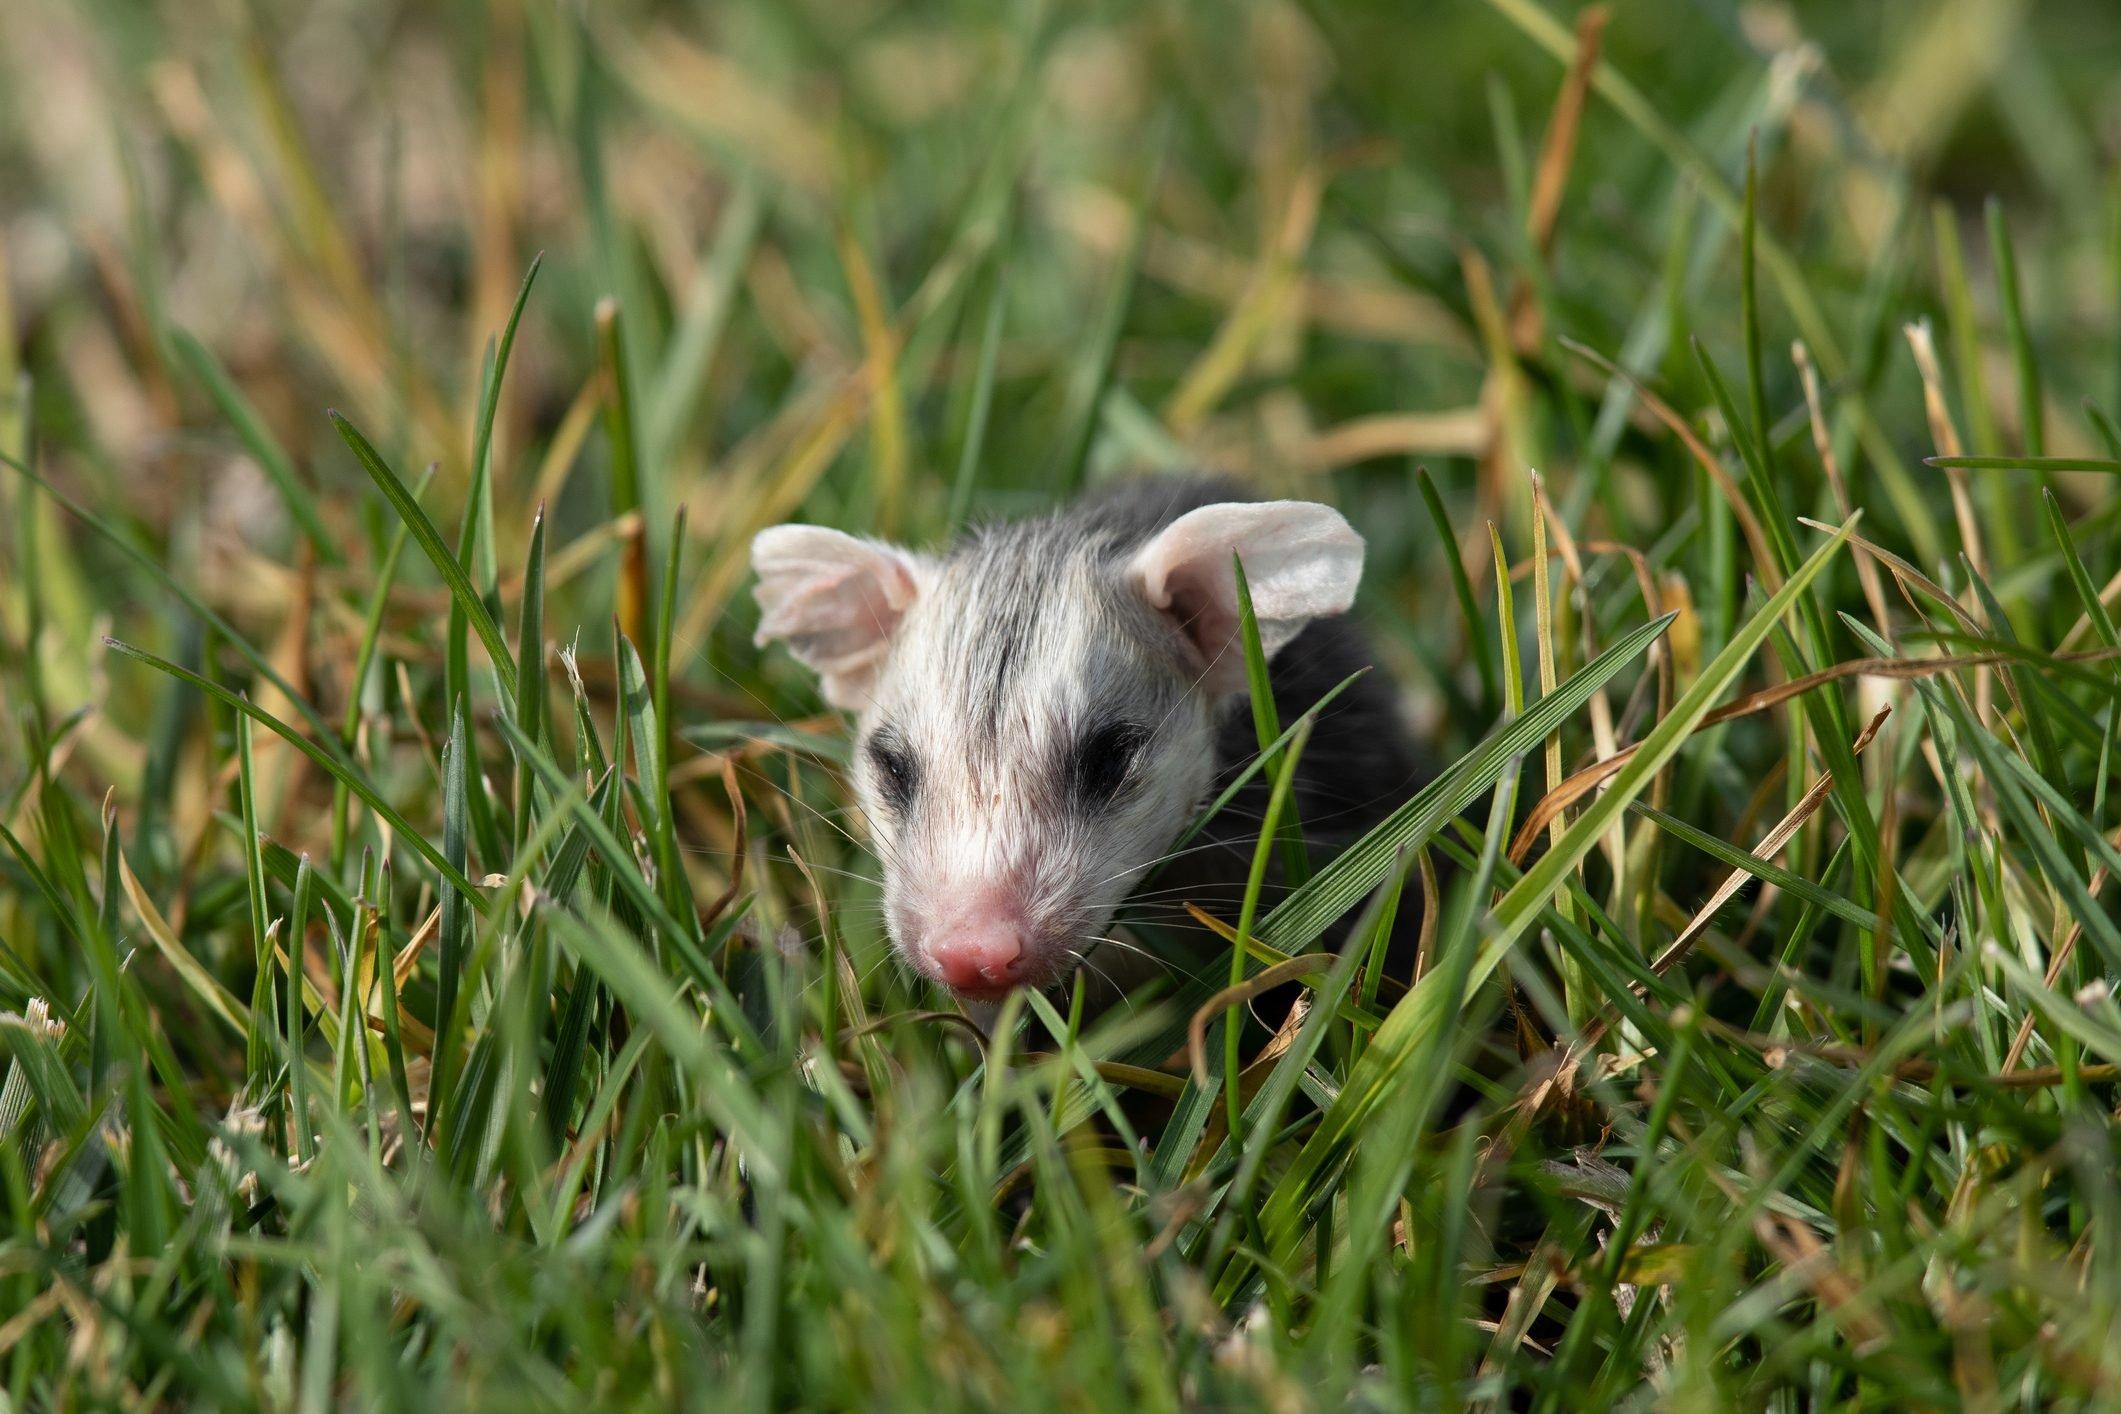 Baby opossum seen in the wild in North California